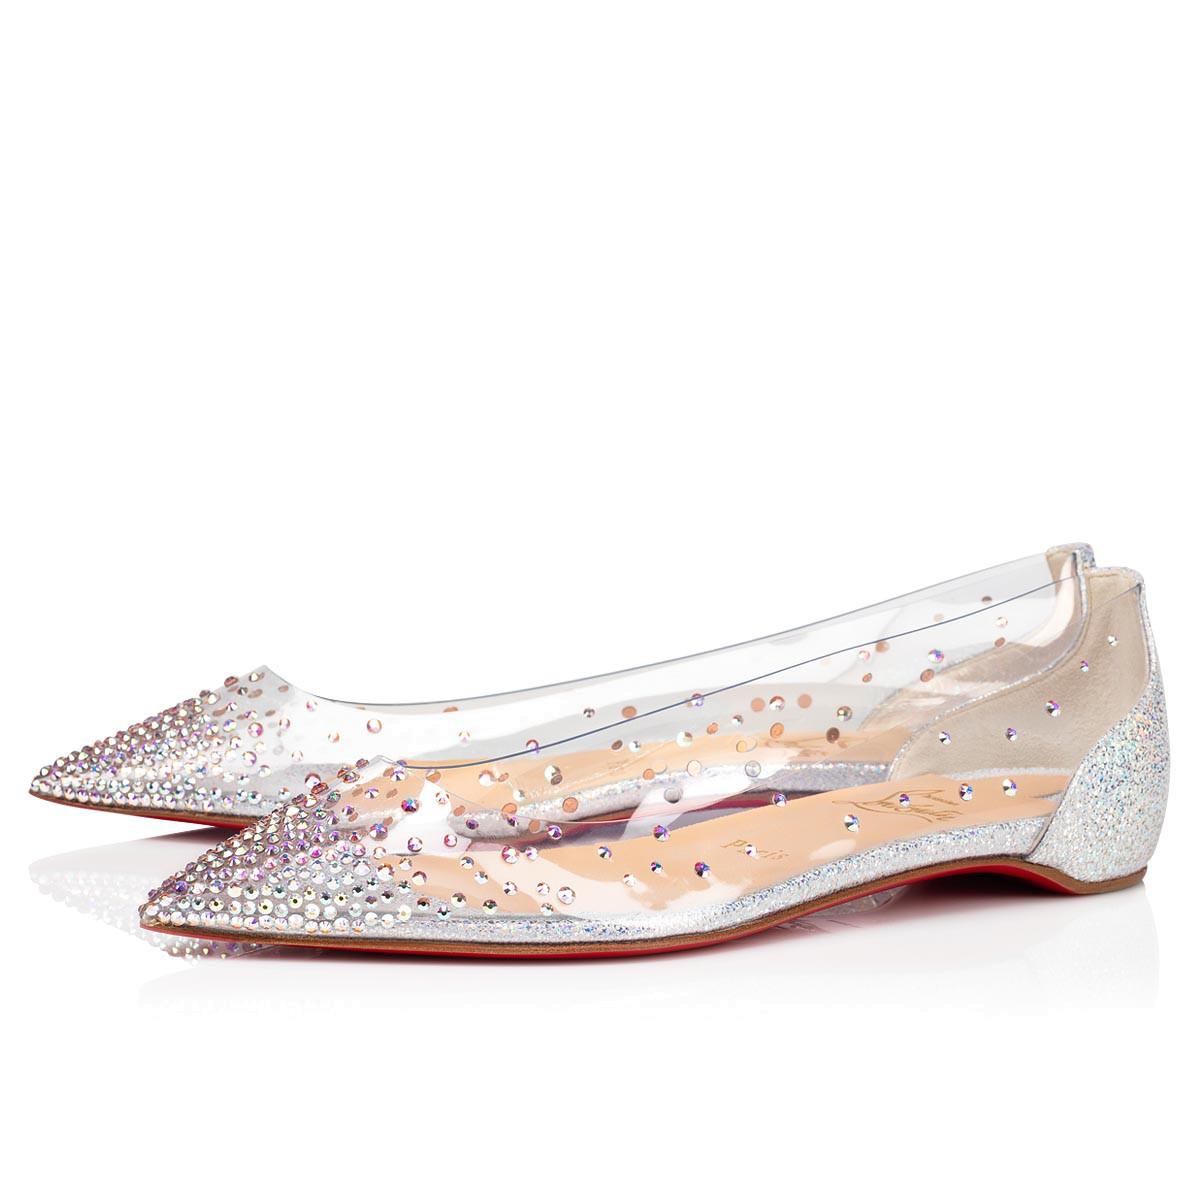 鞋履 - Degrastrass Pvc Flat Pvc/nappa - Christian Louboutin